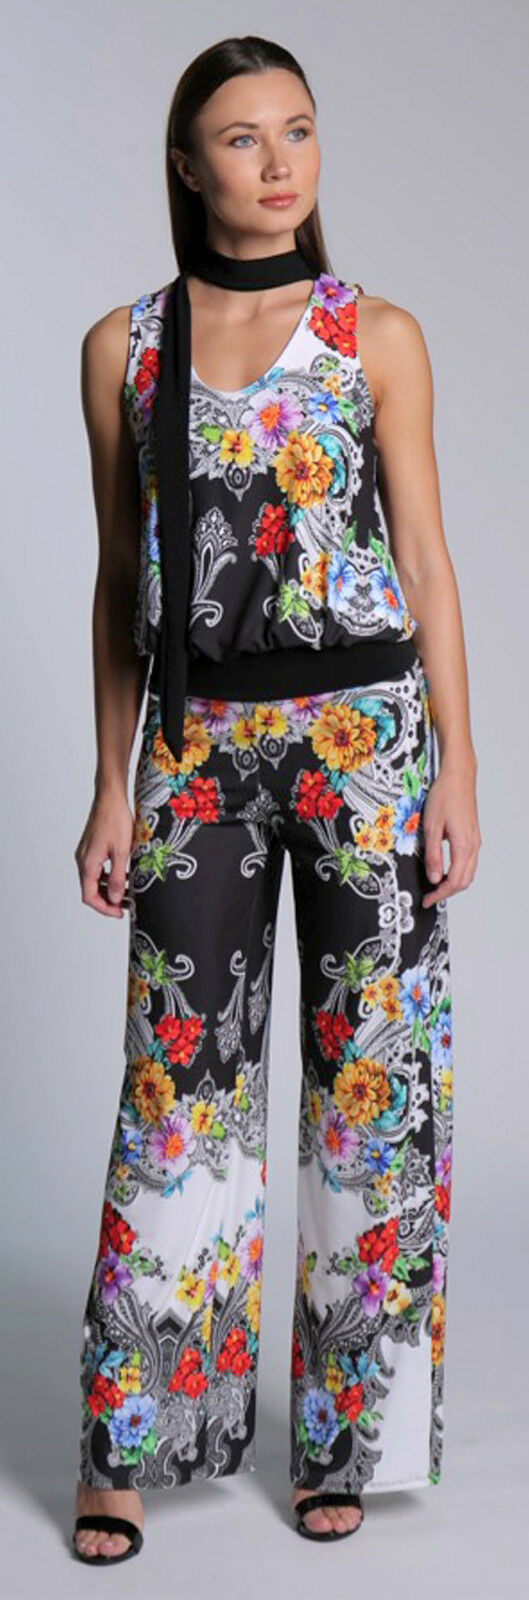 Julian Chang Designer  Jumpsuit  Weiß Multi Floral Print Sz XLarge